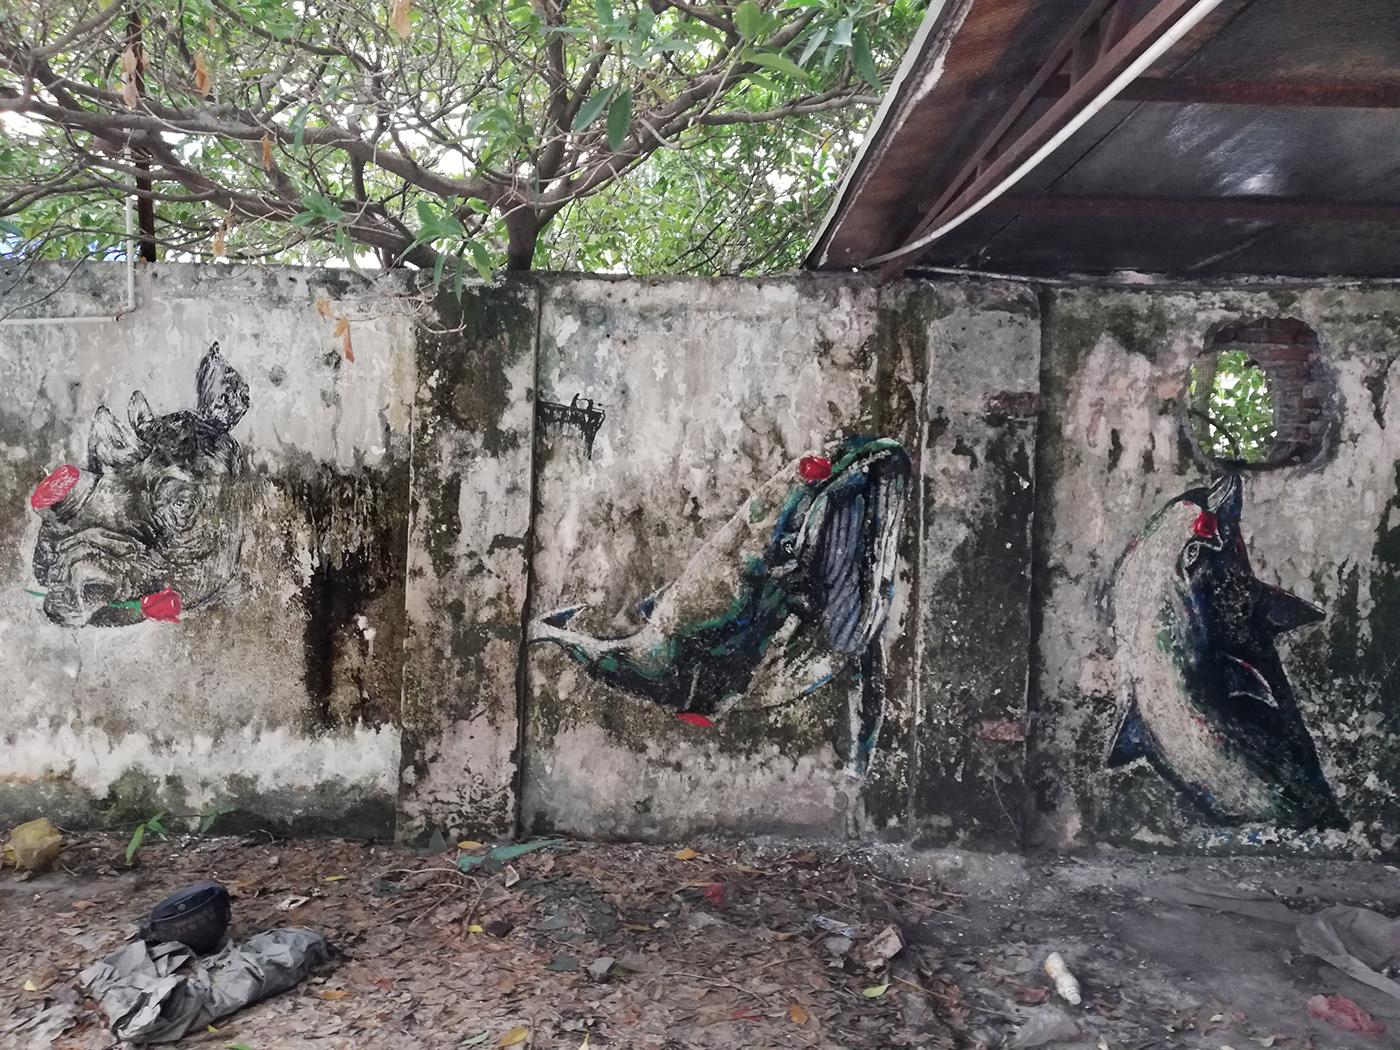 Image may contain: outdoor, abandoned and graffiti